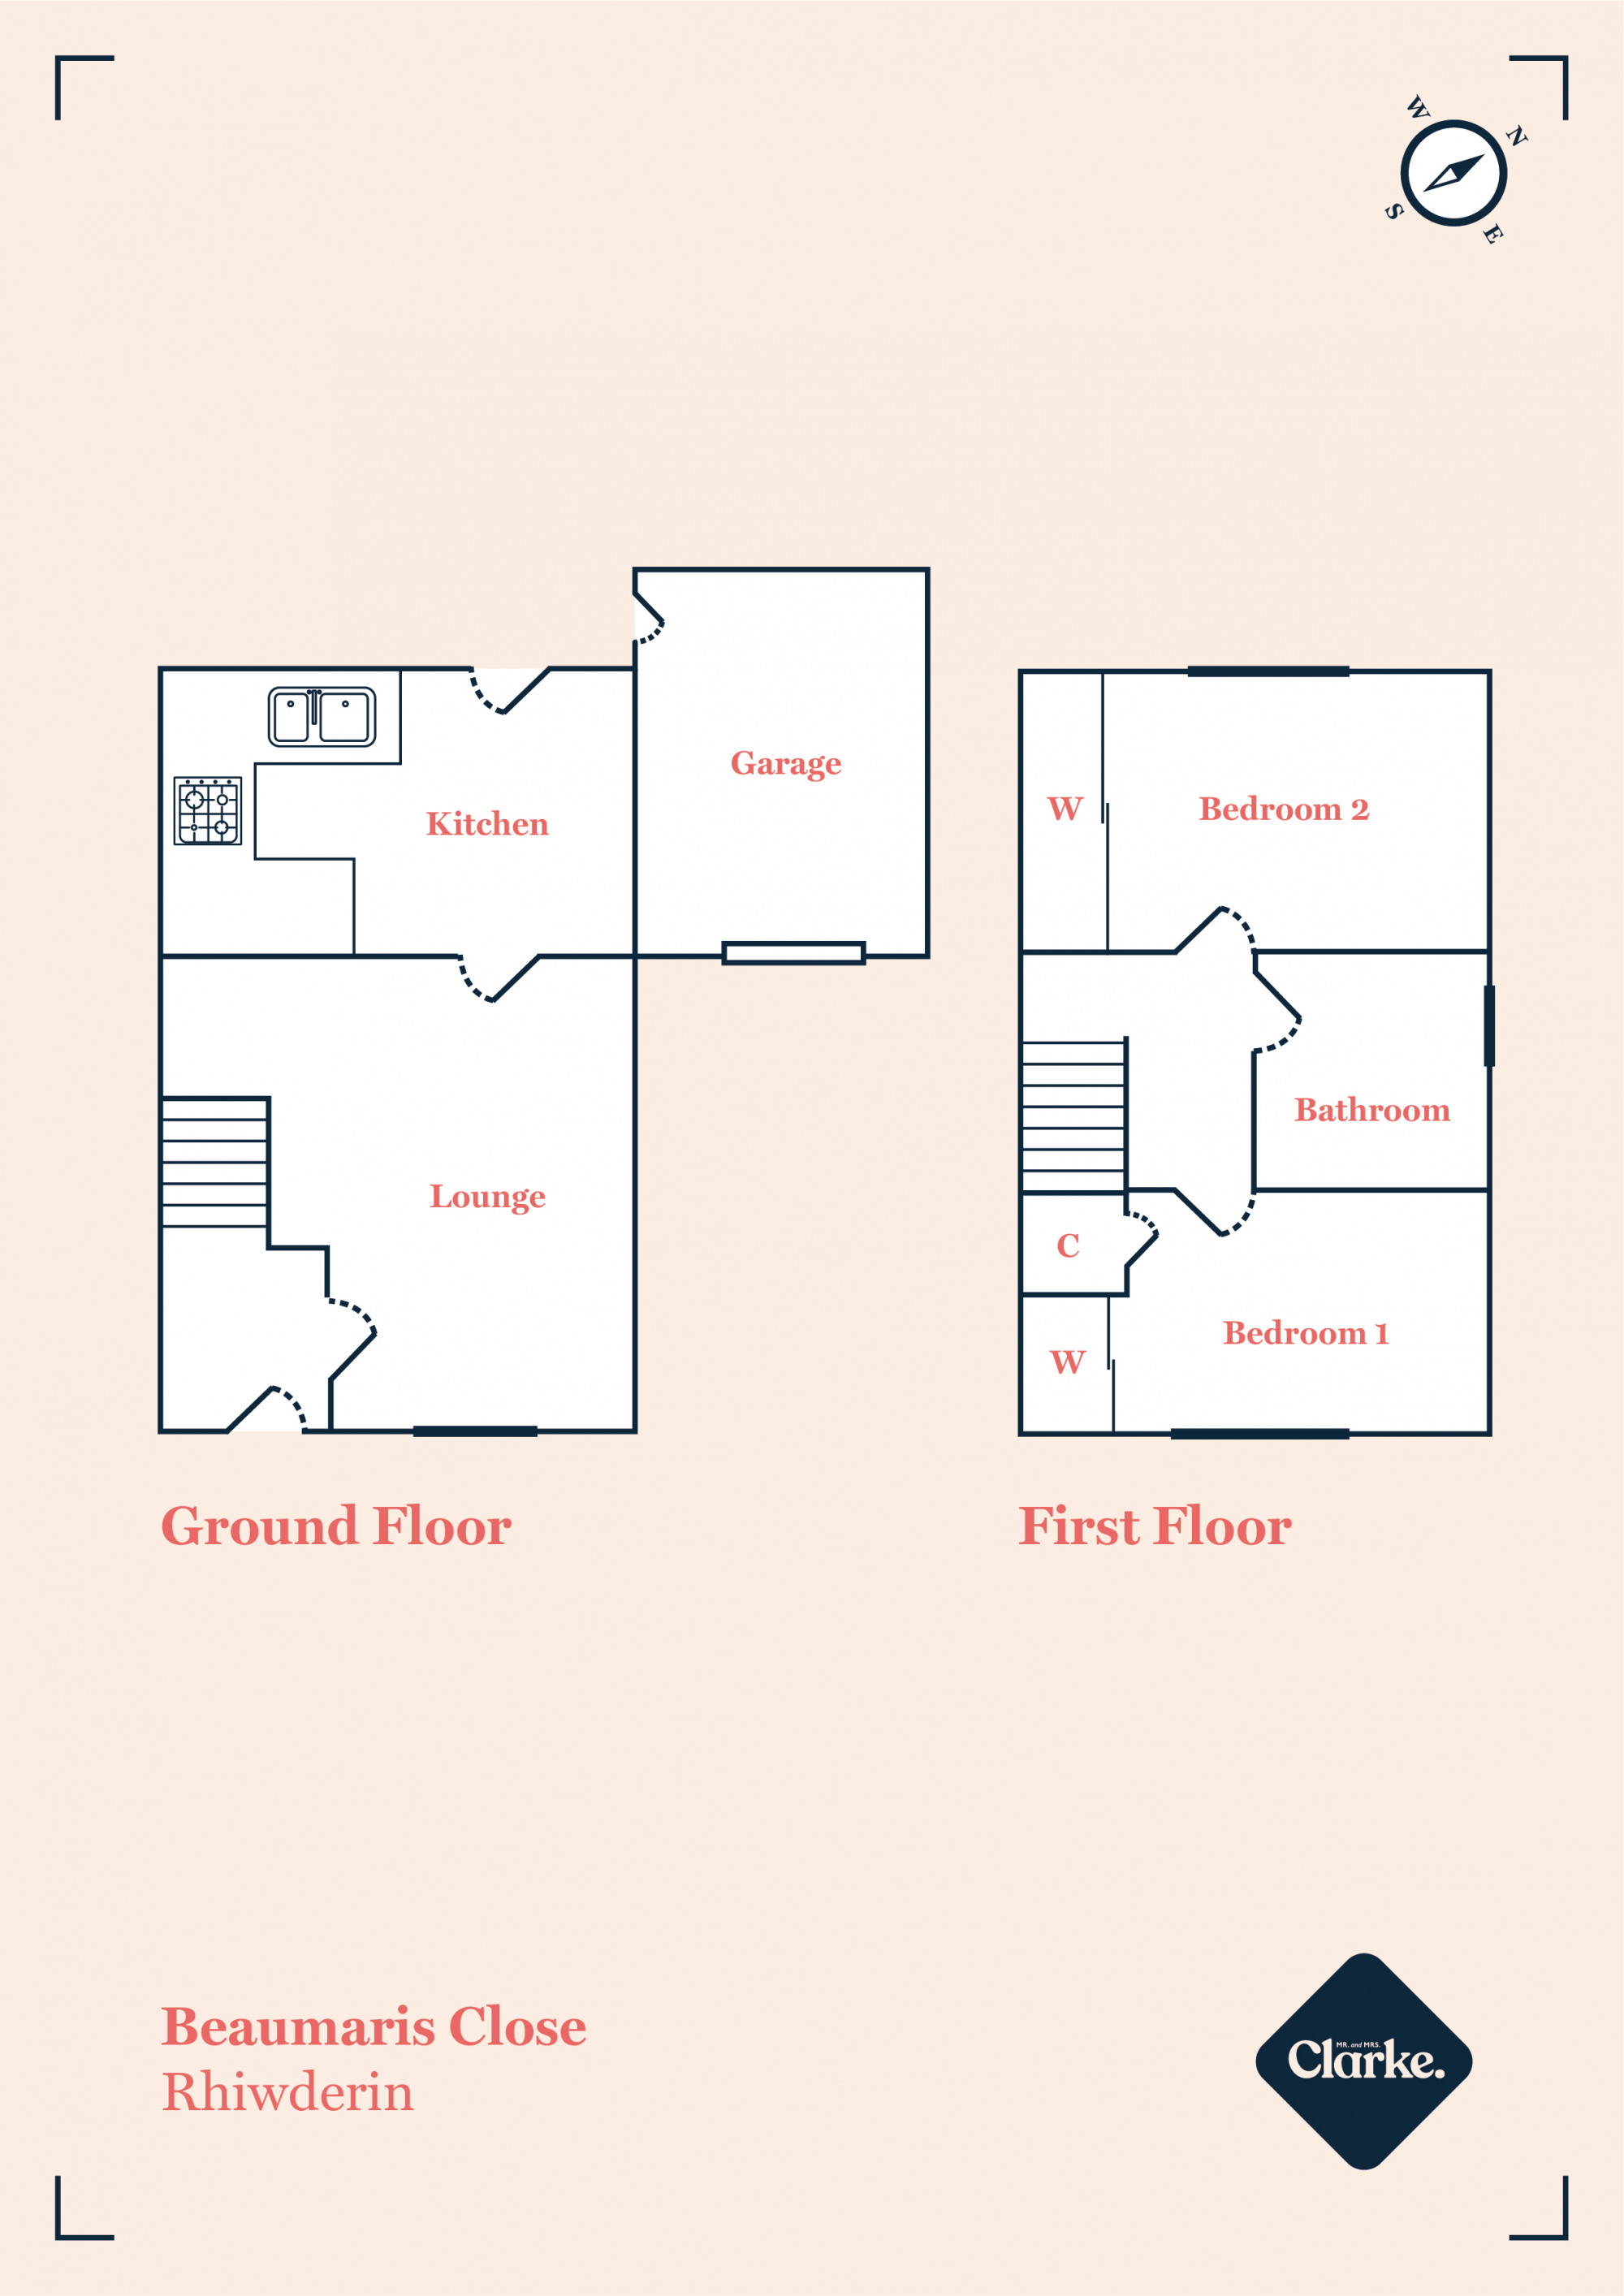 Beaumaris Close, Rhiwderin. Floorplan.